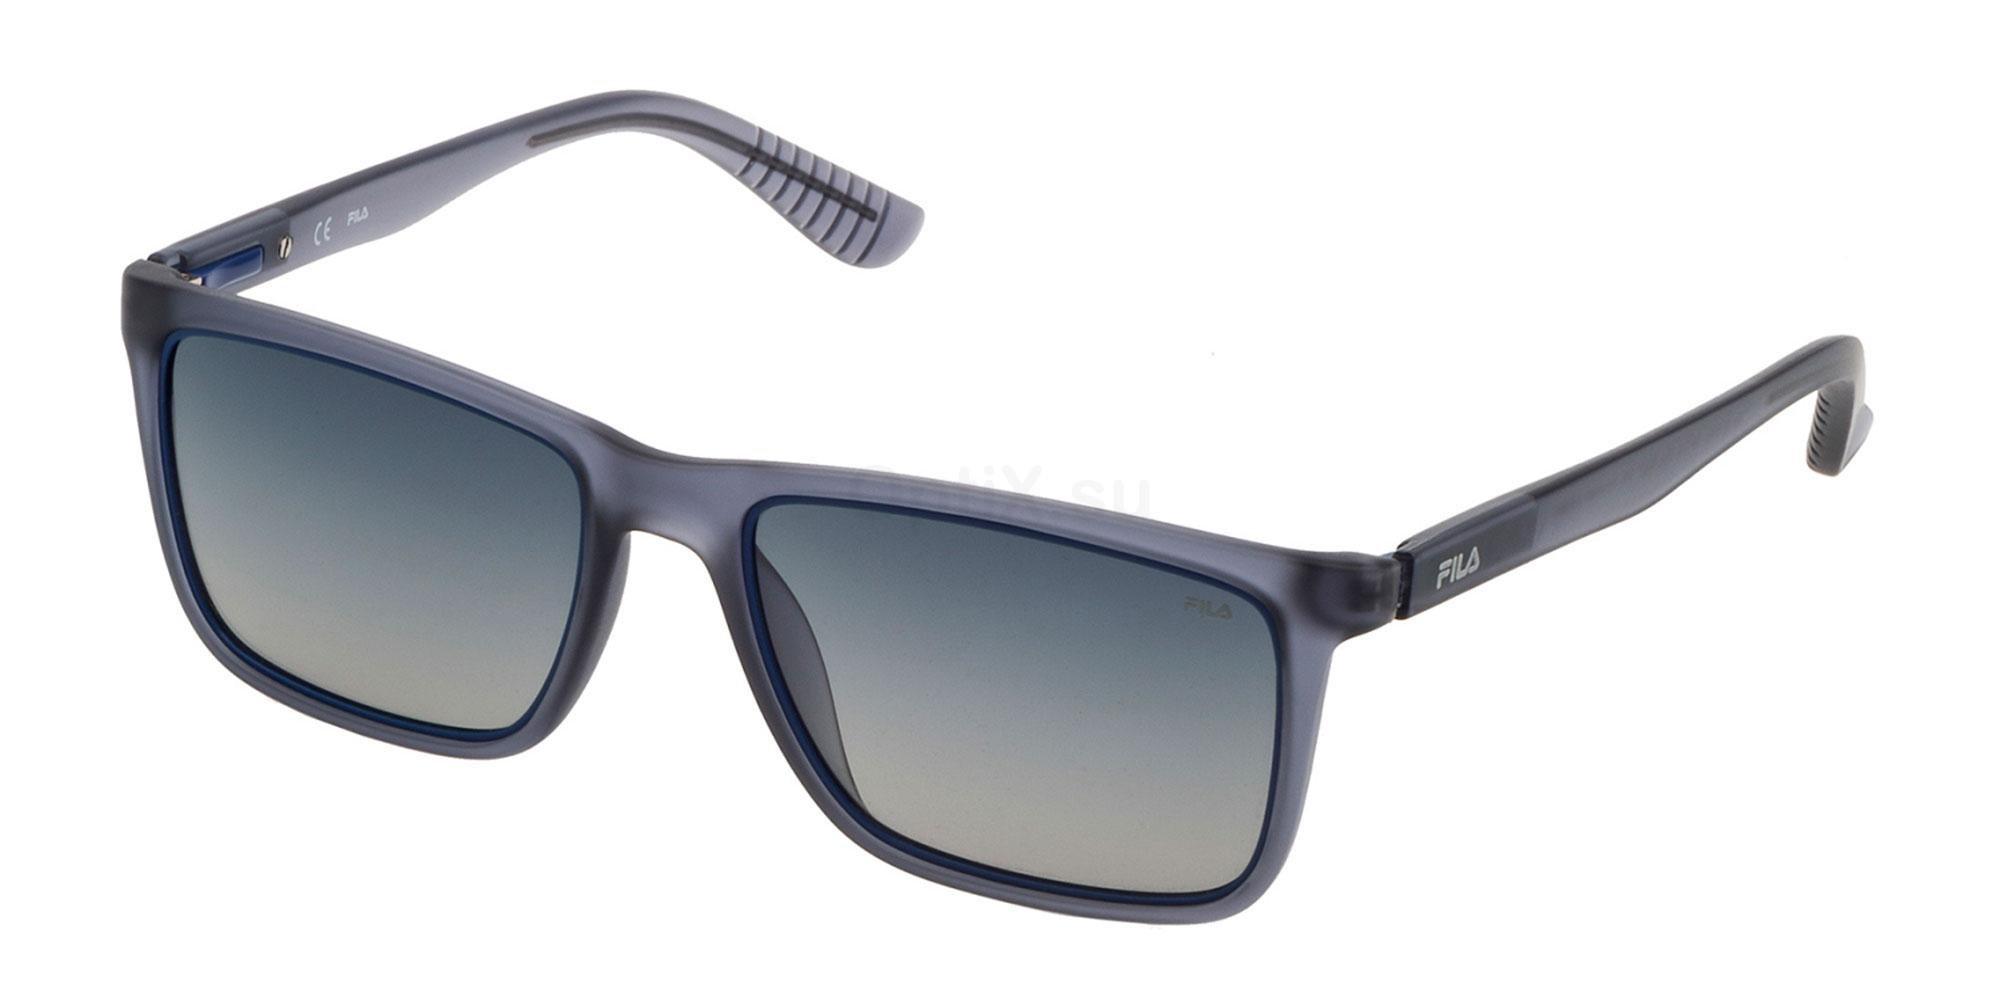 4G0P SF9245 Sunglasses, Fila